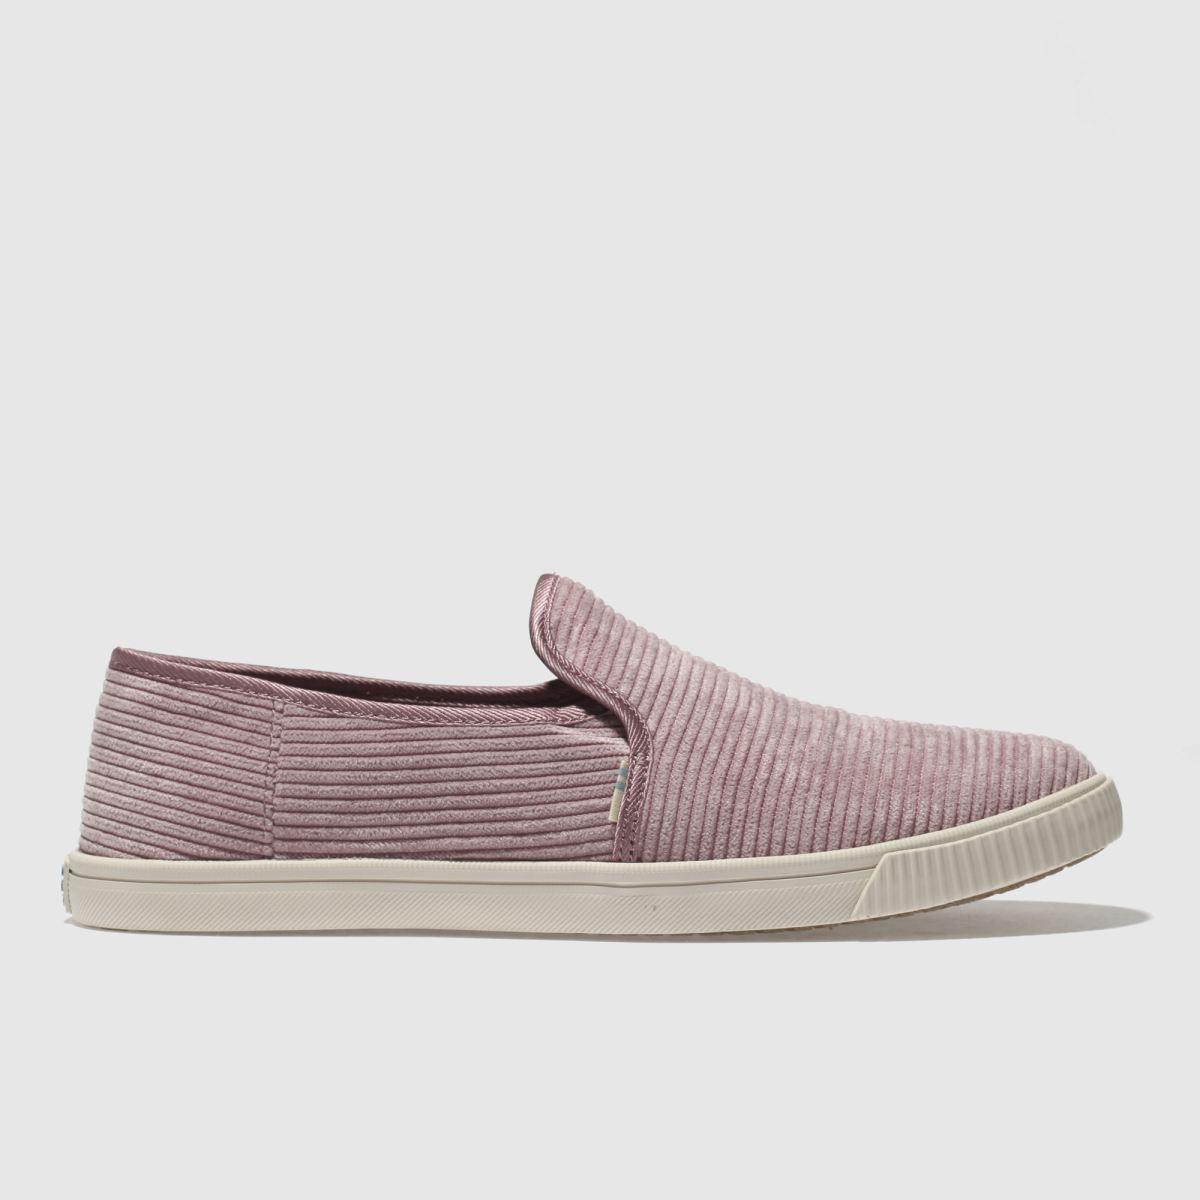 Toms Lilac Clemente Flat Shoes